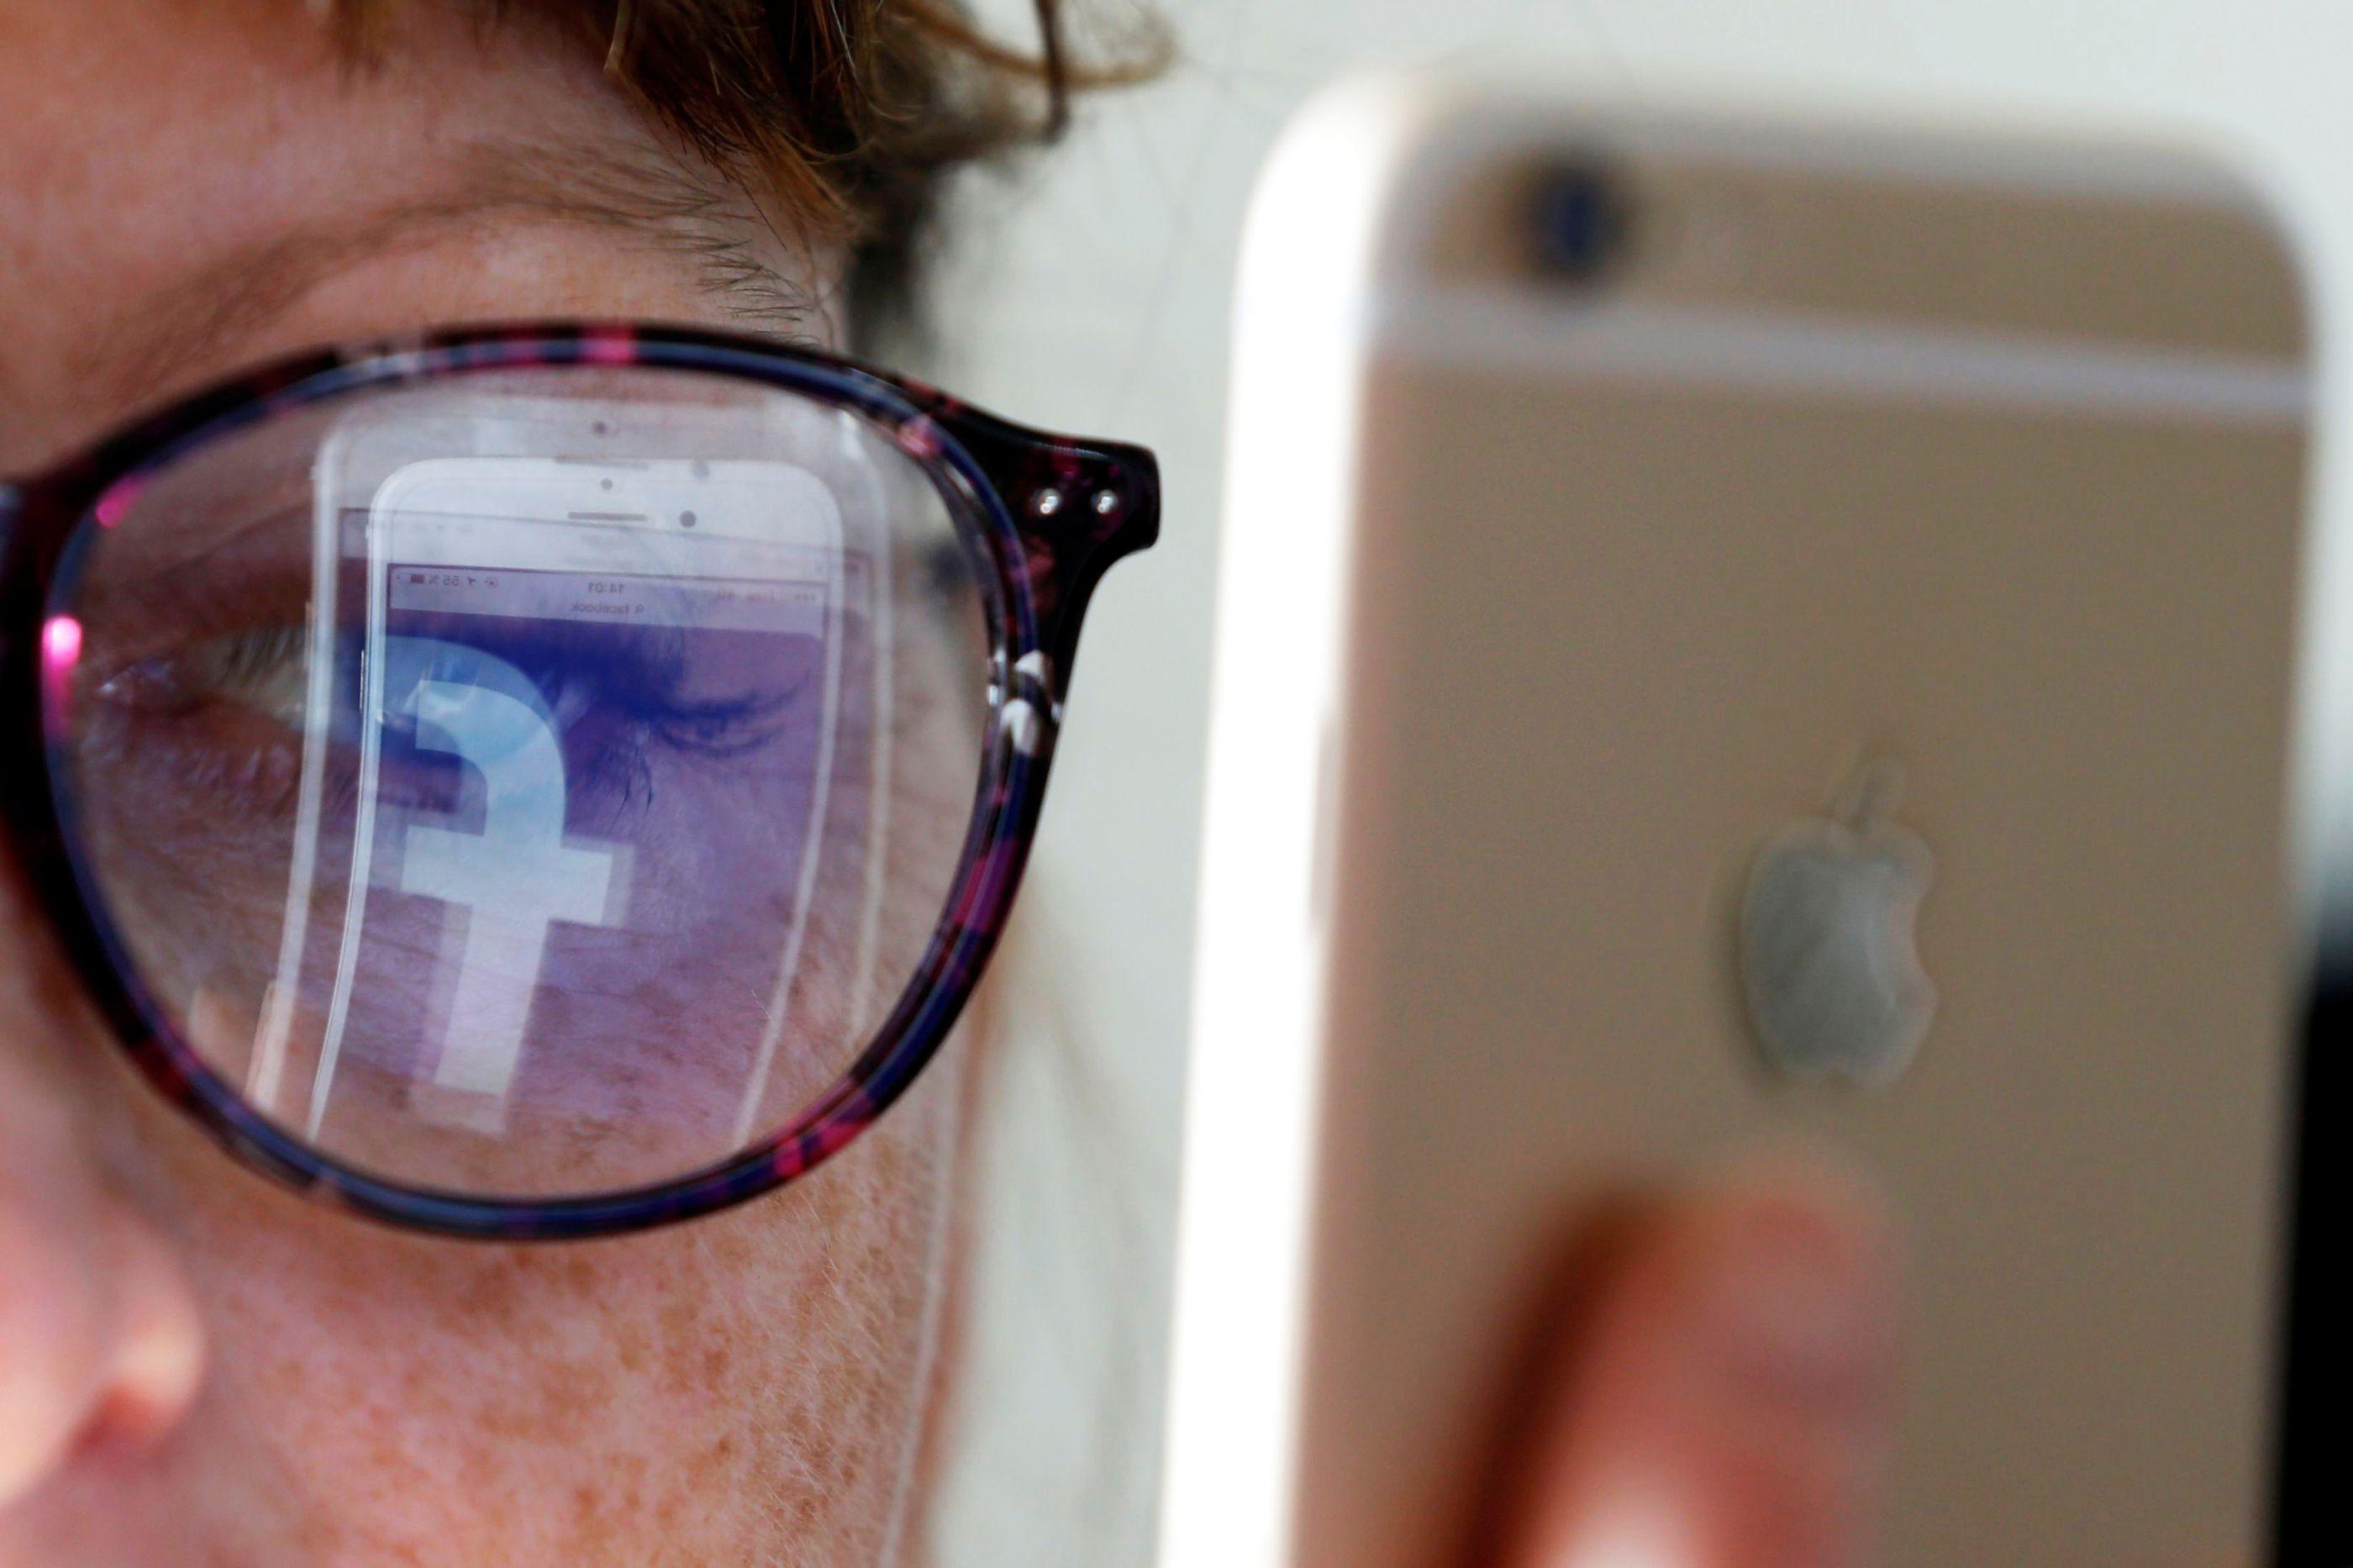 Facebook volta a ser criticado por censurar obras de arte antiga com nús